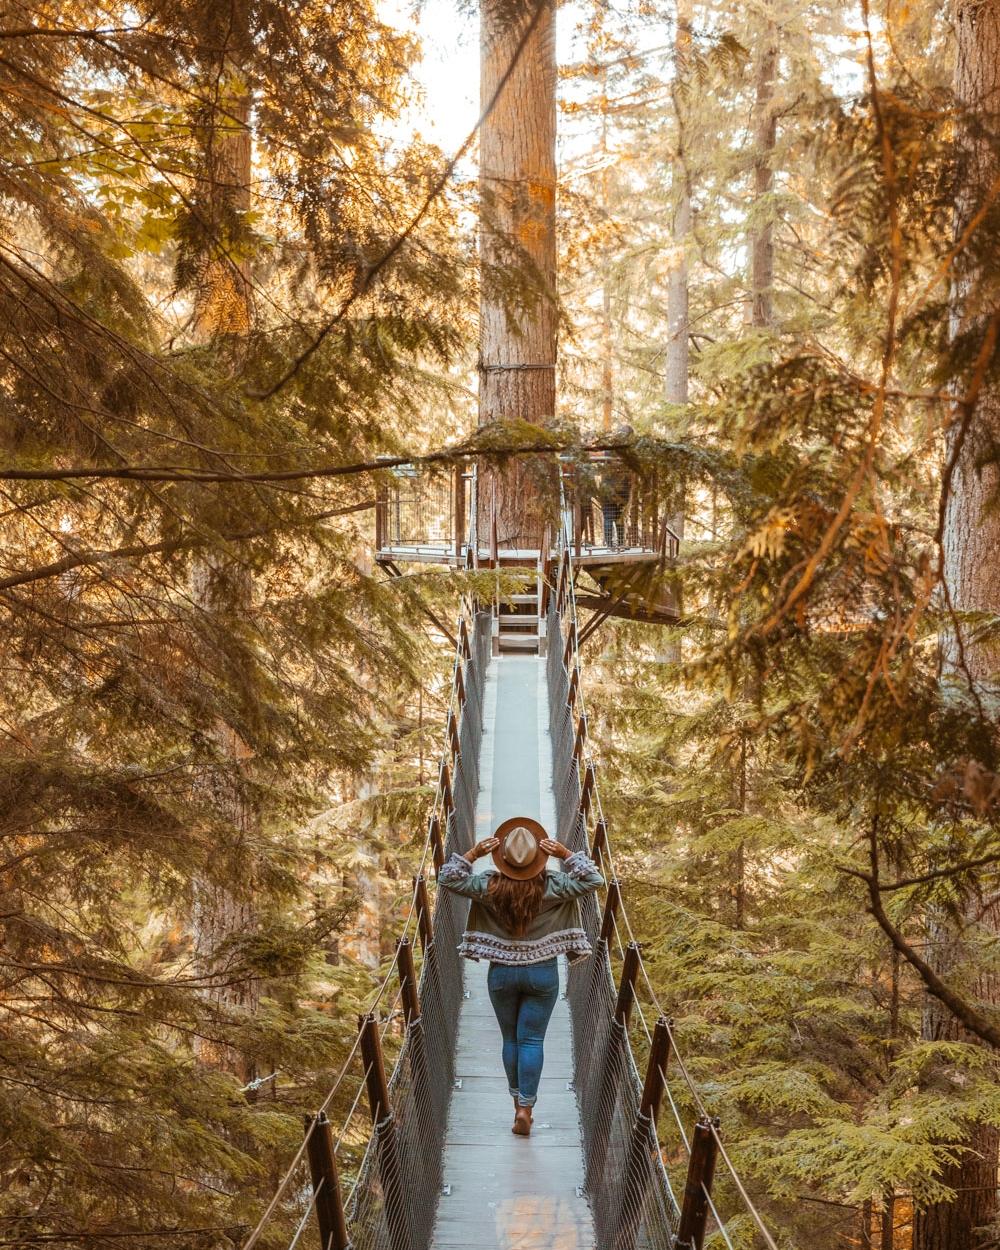 Capilano Suspension Bridge Park // The Quick Guide to Visiting Vancouver, BC #readysetjetset